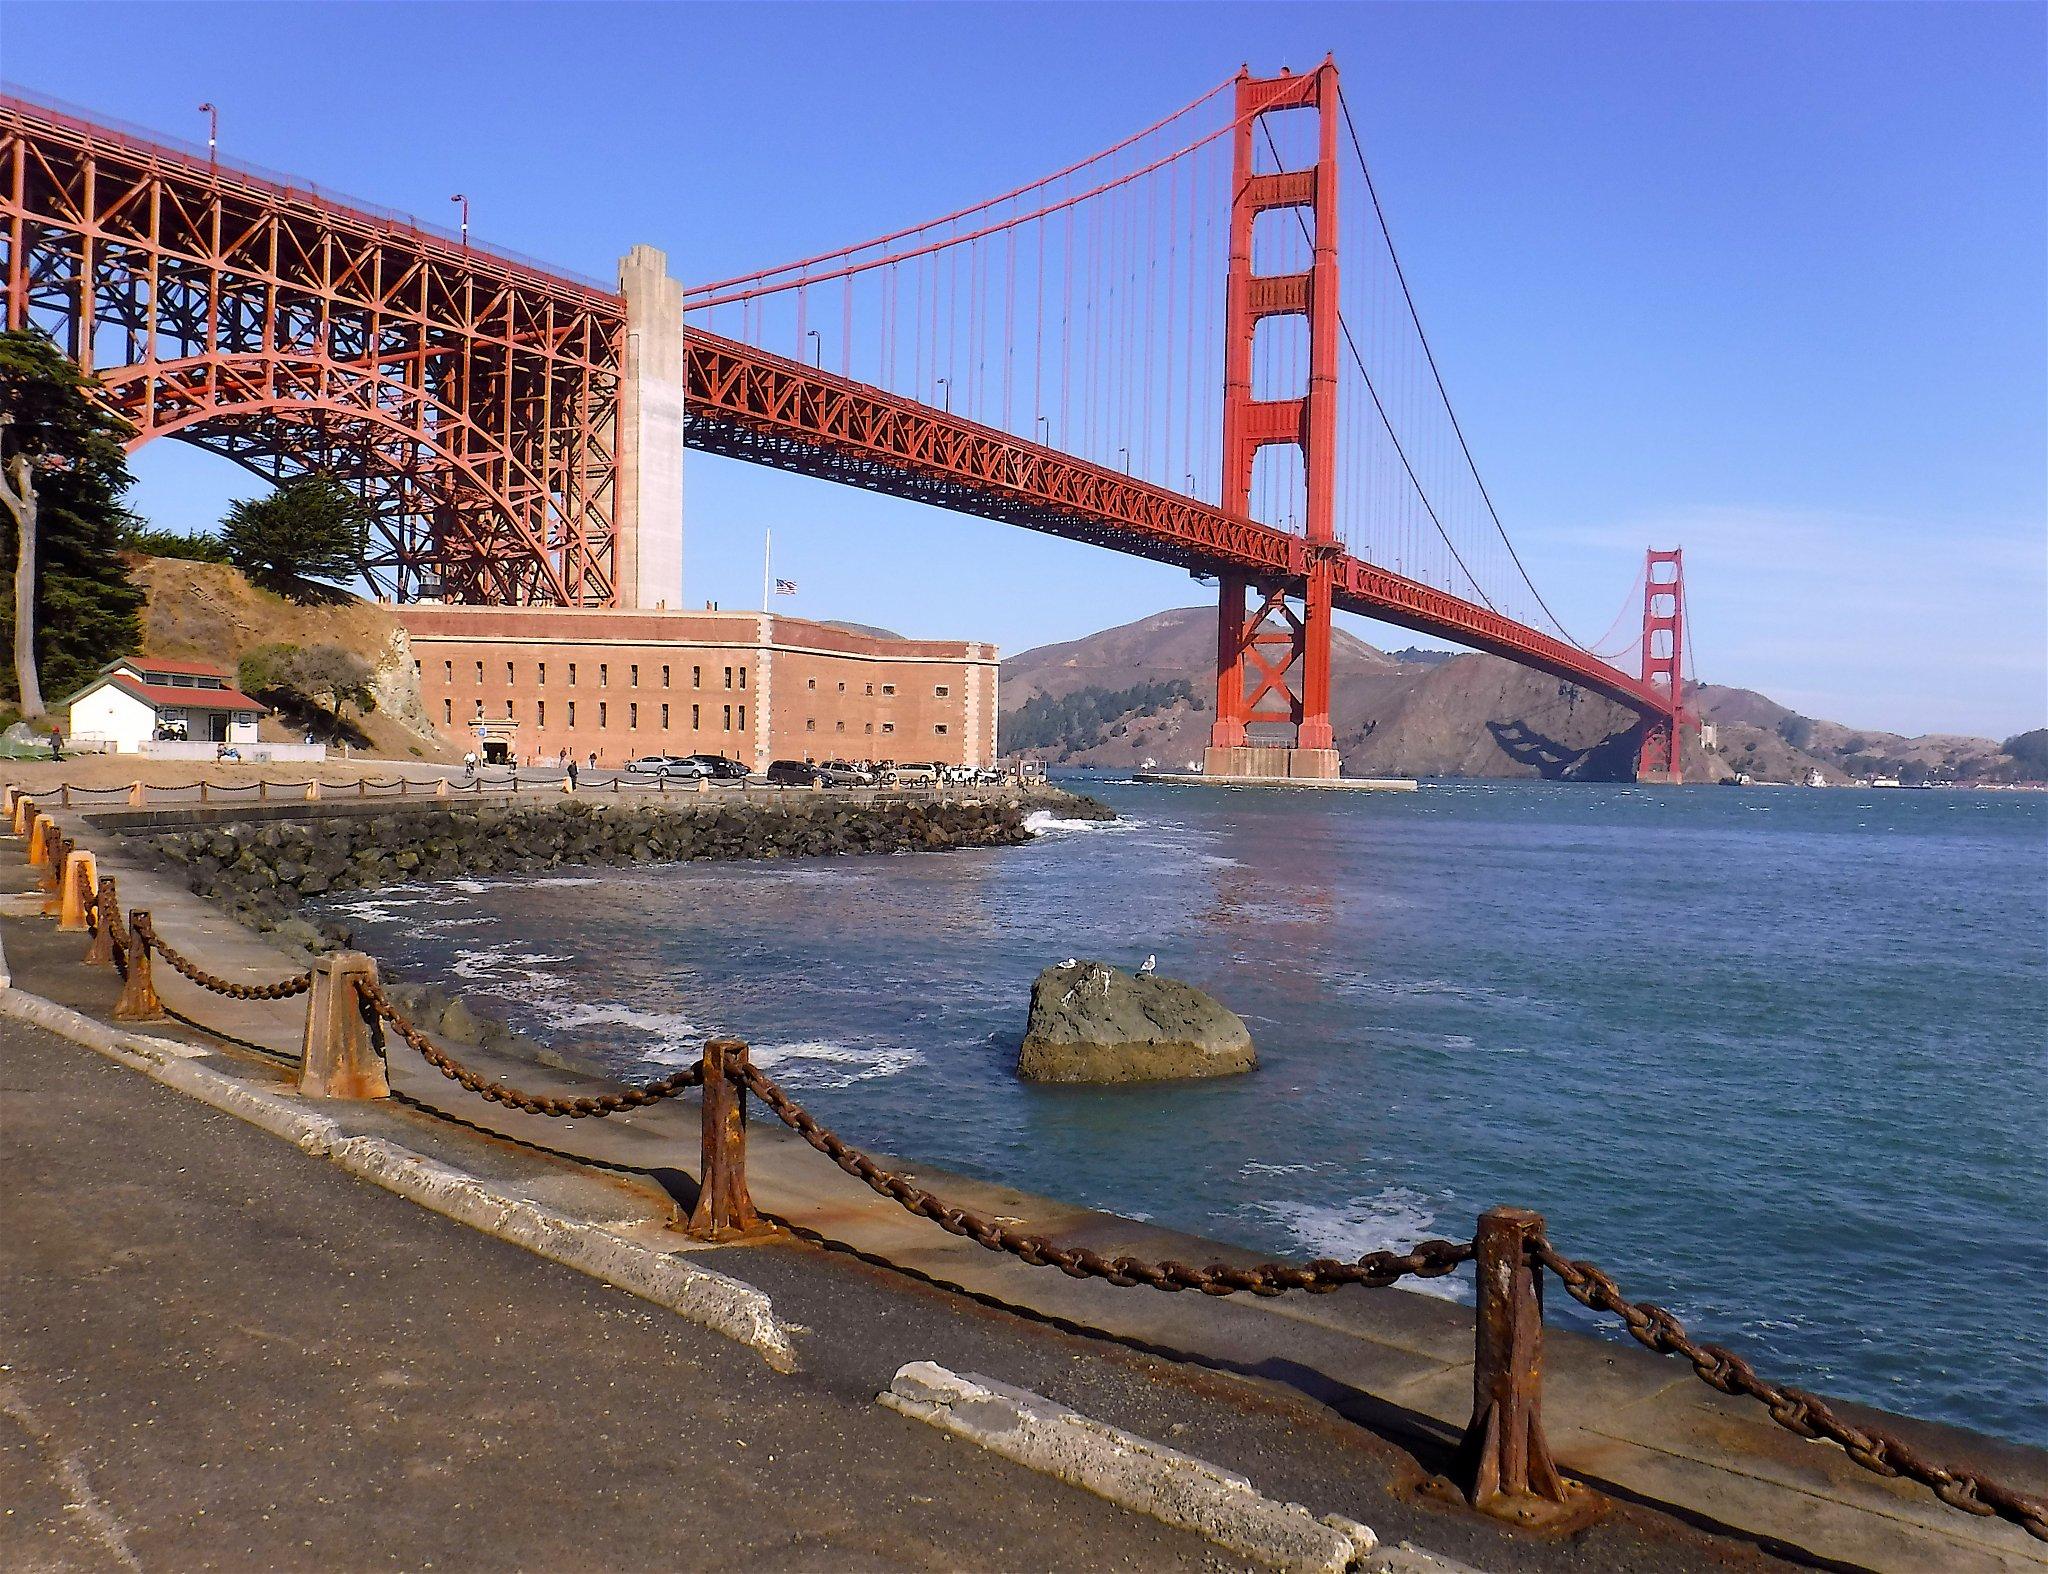 Sunday Getaway To The Golden Gate Bridge